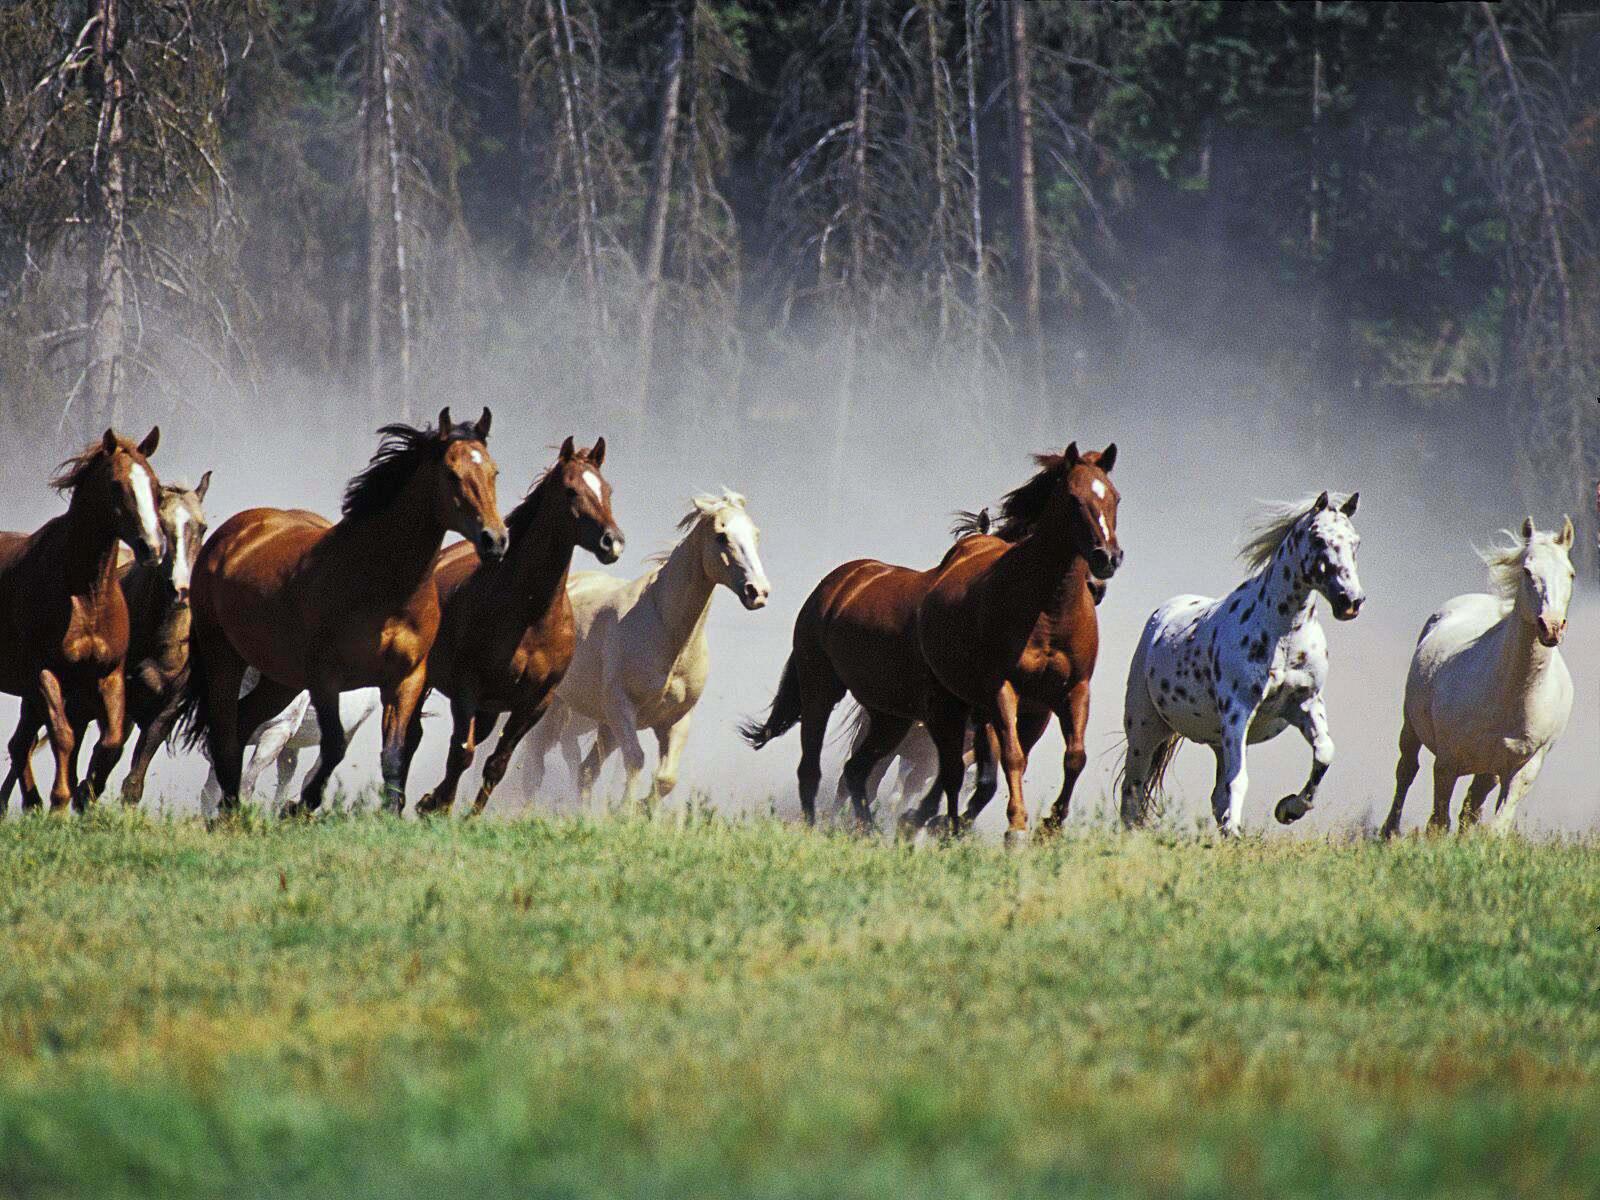 032 koně zvířata horses animals